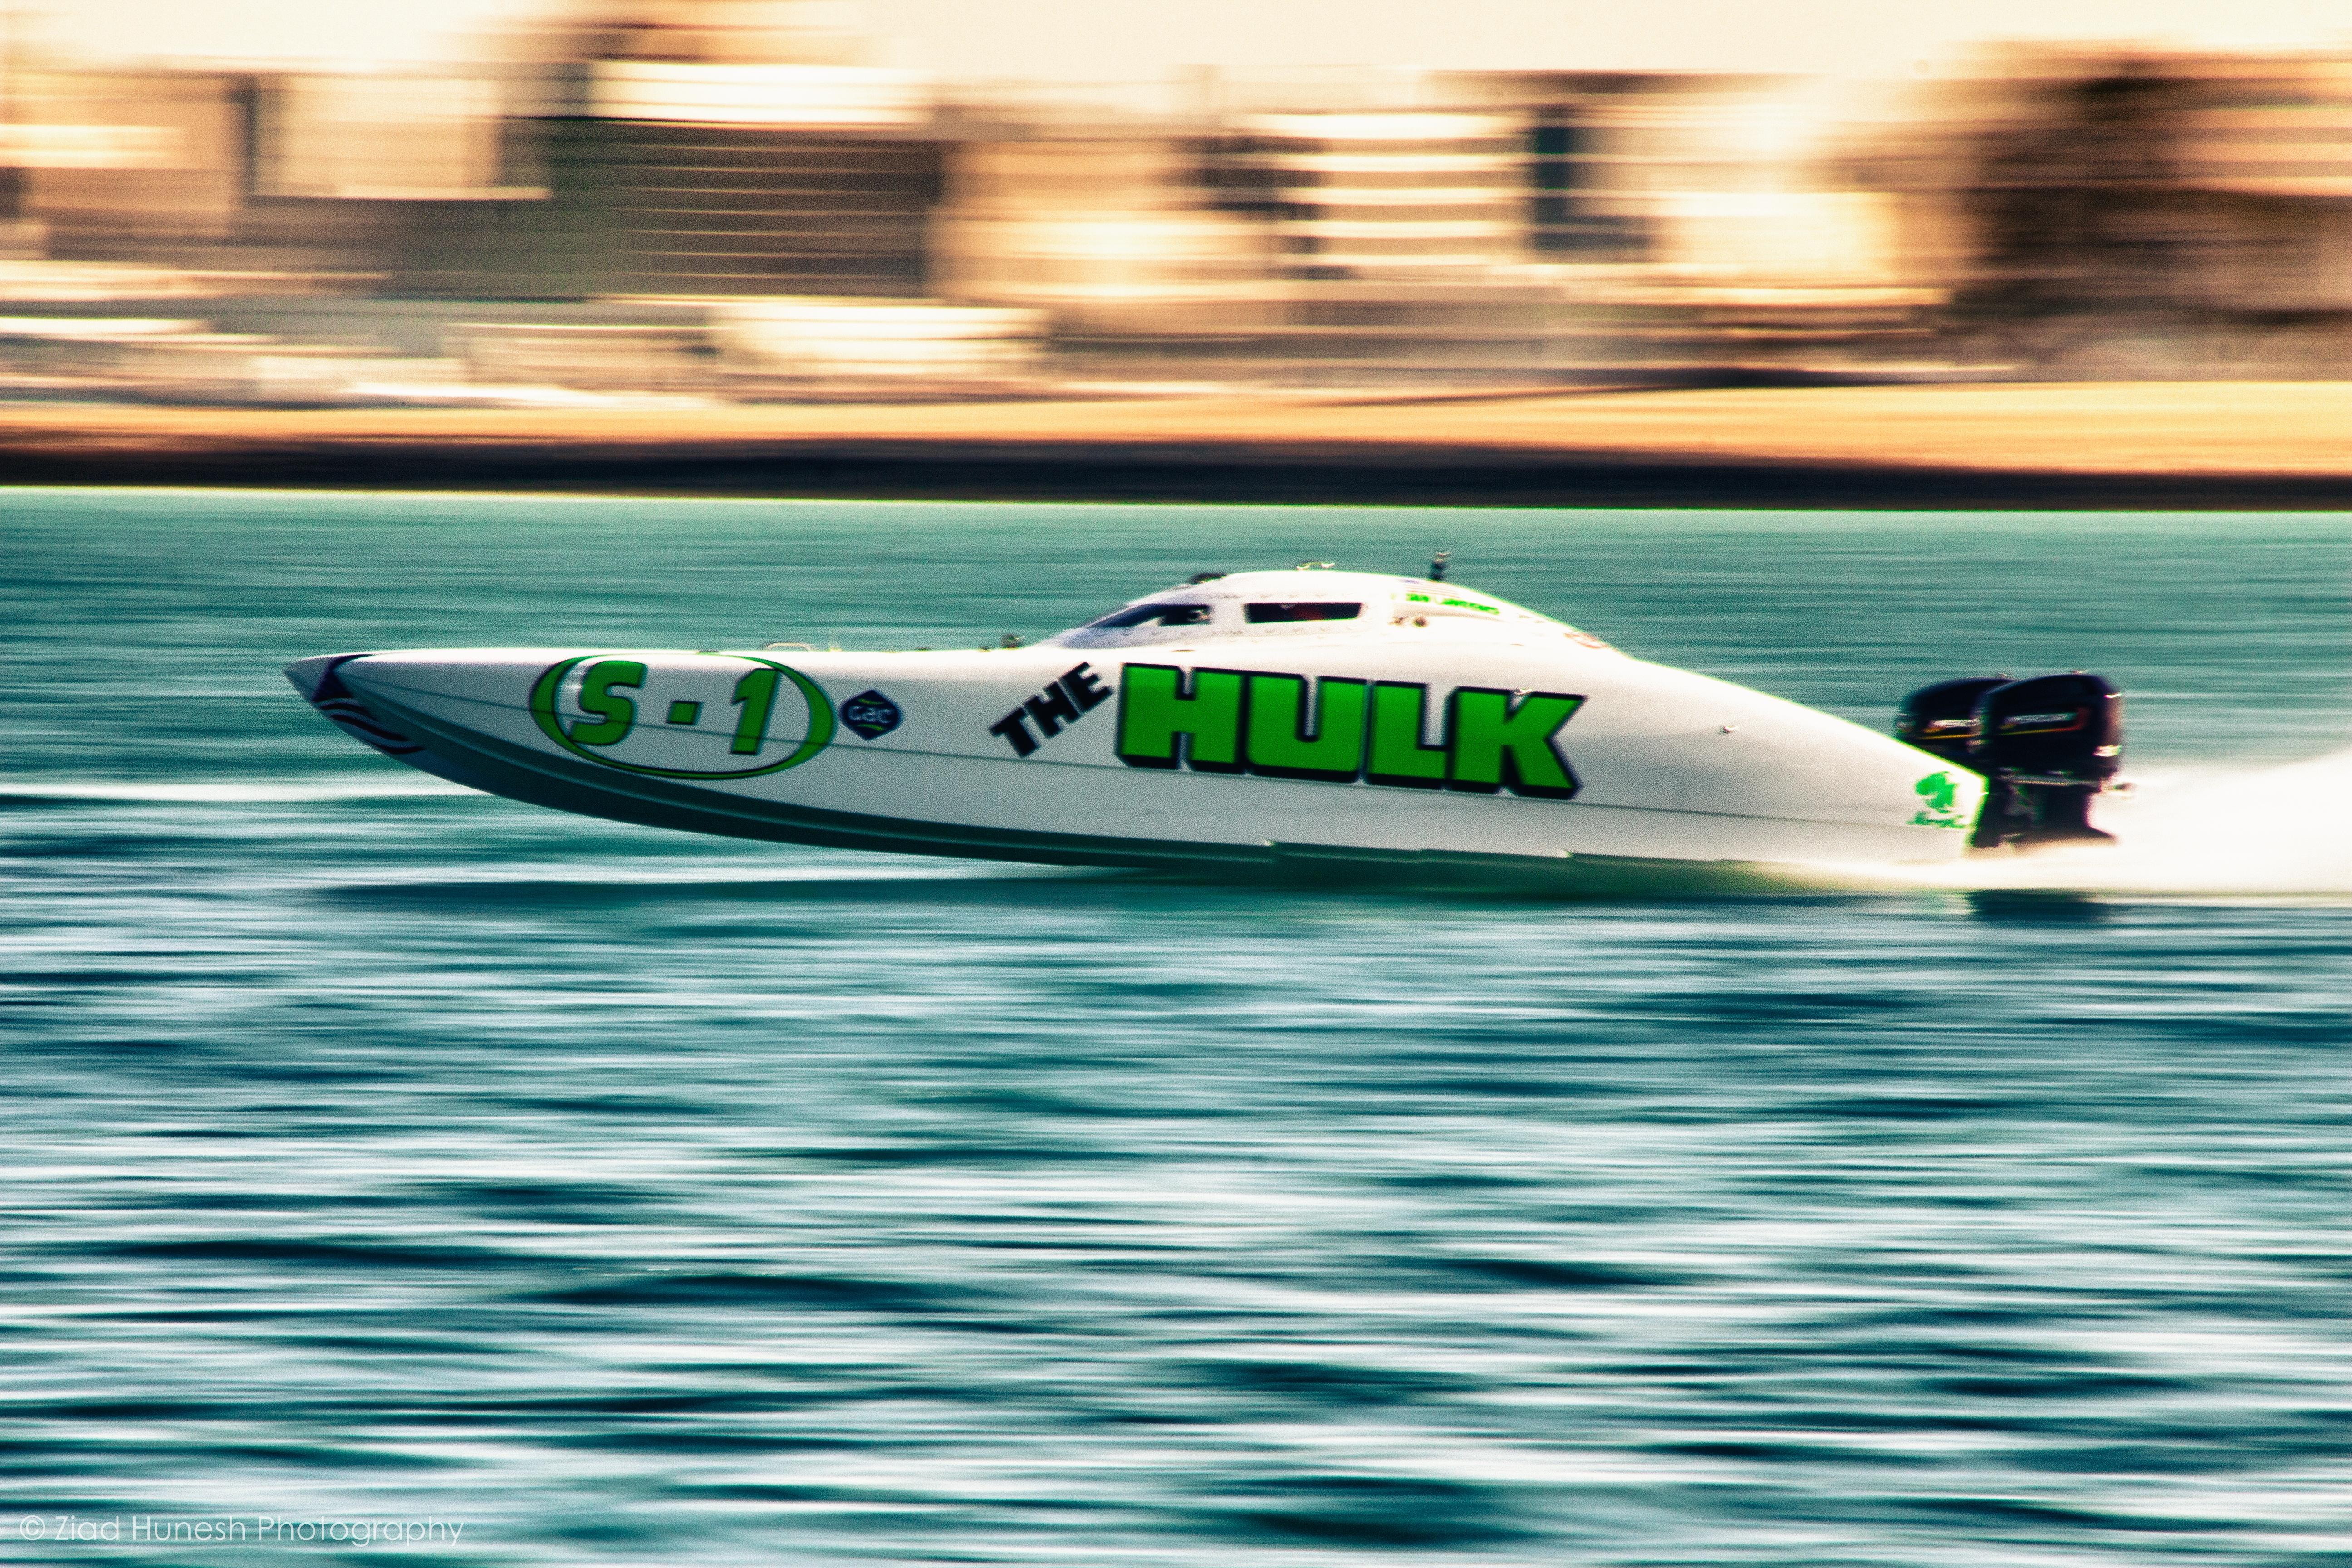 Wallpaper : hydroplane racing, water transportation